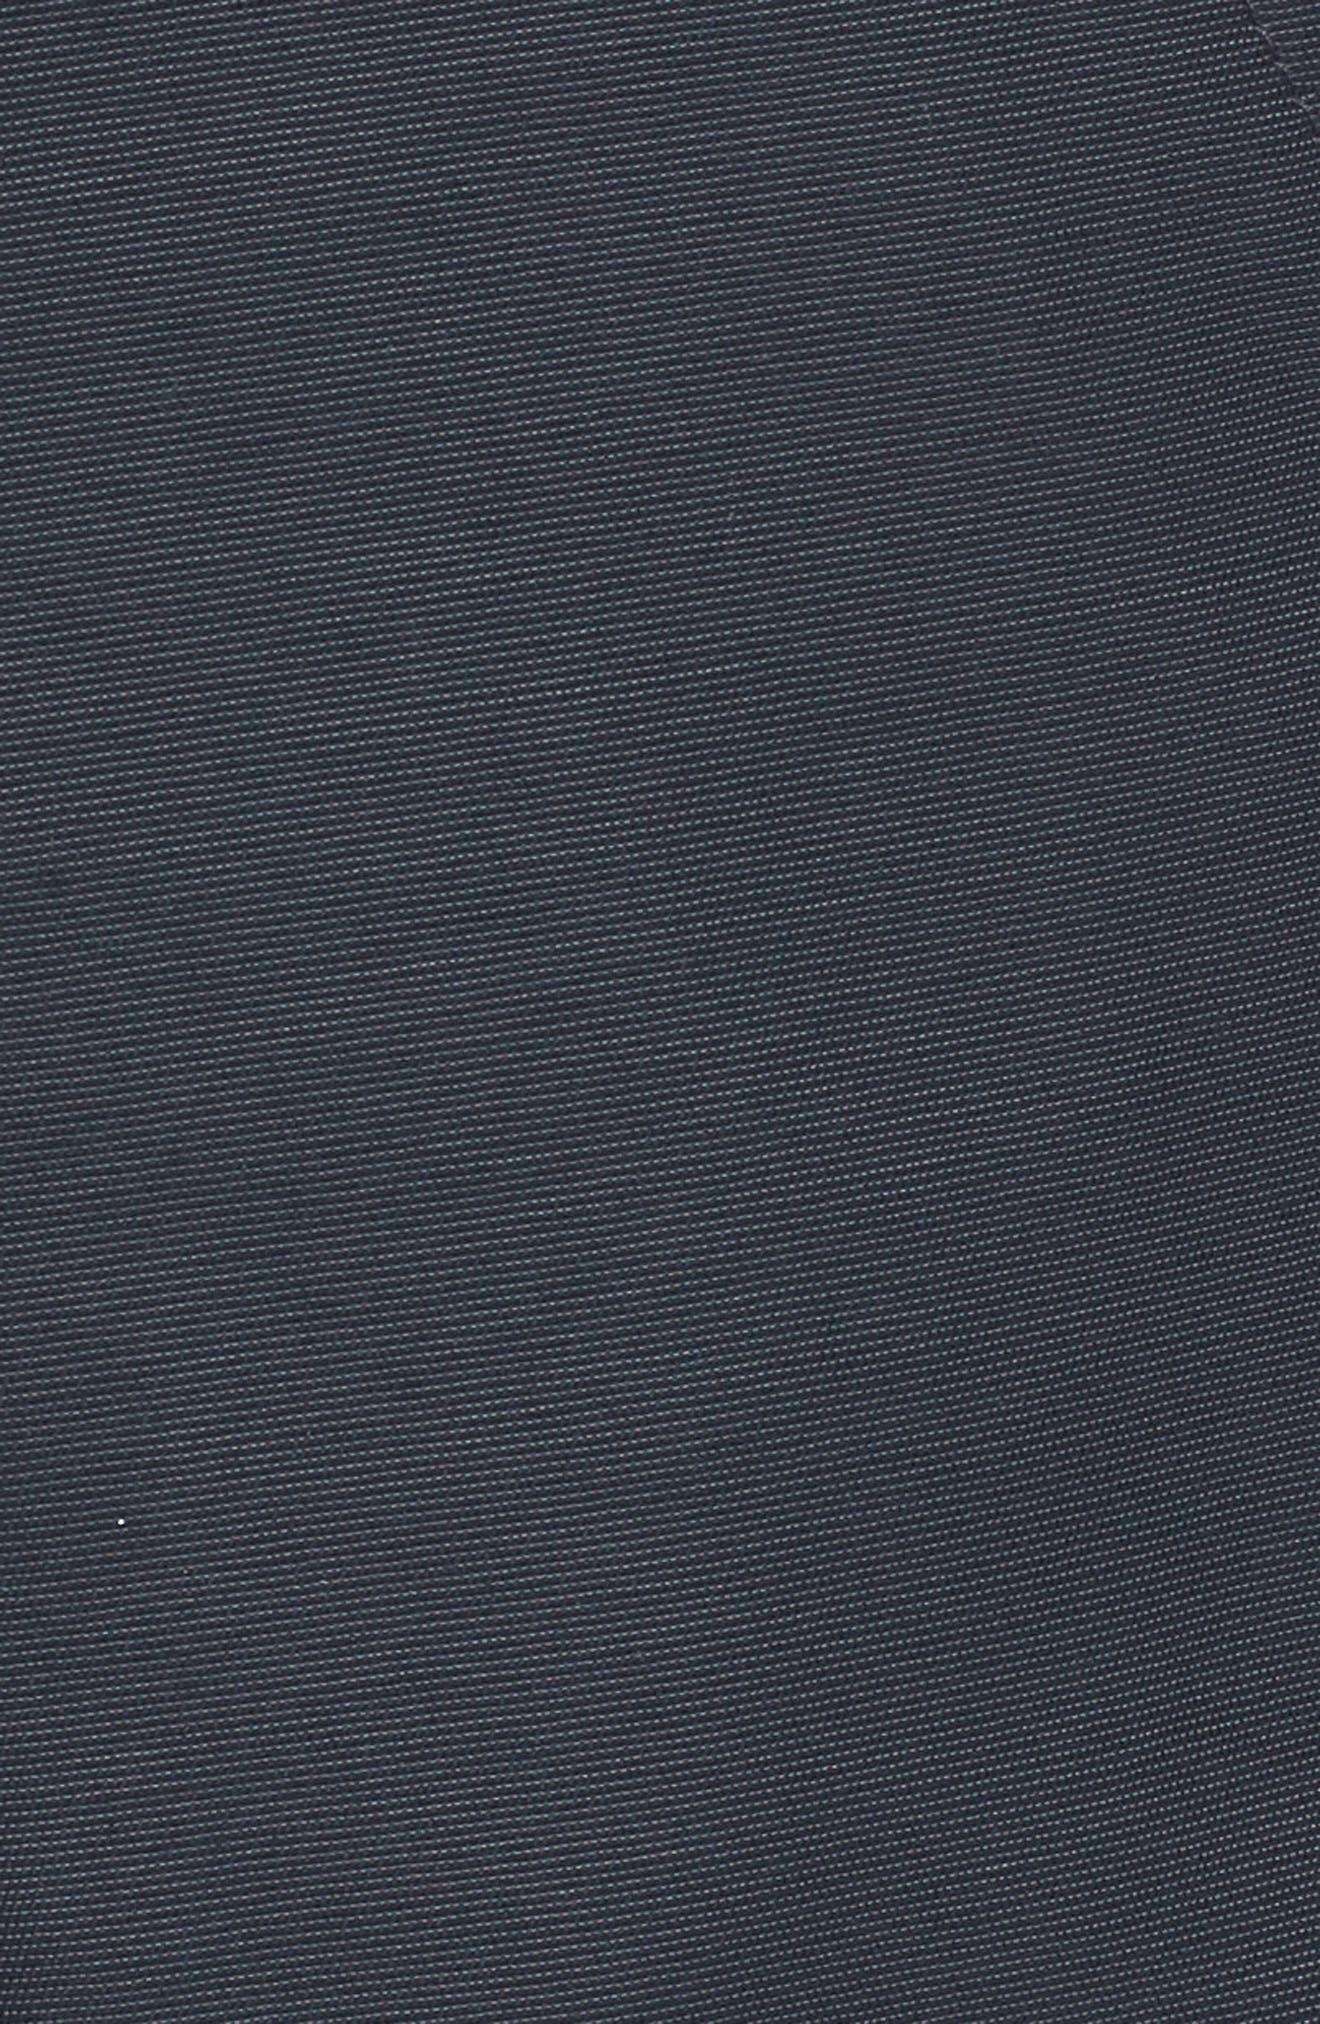 'Ballistic' Bomber Jacket with Genuine Fox Fur Trim,                             Alternate thumbnail 7, color,                             DARK NAVY/ NATURAL FOX